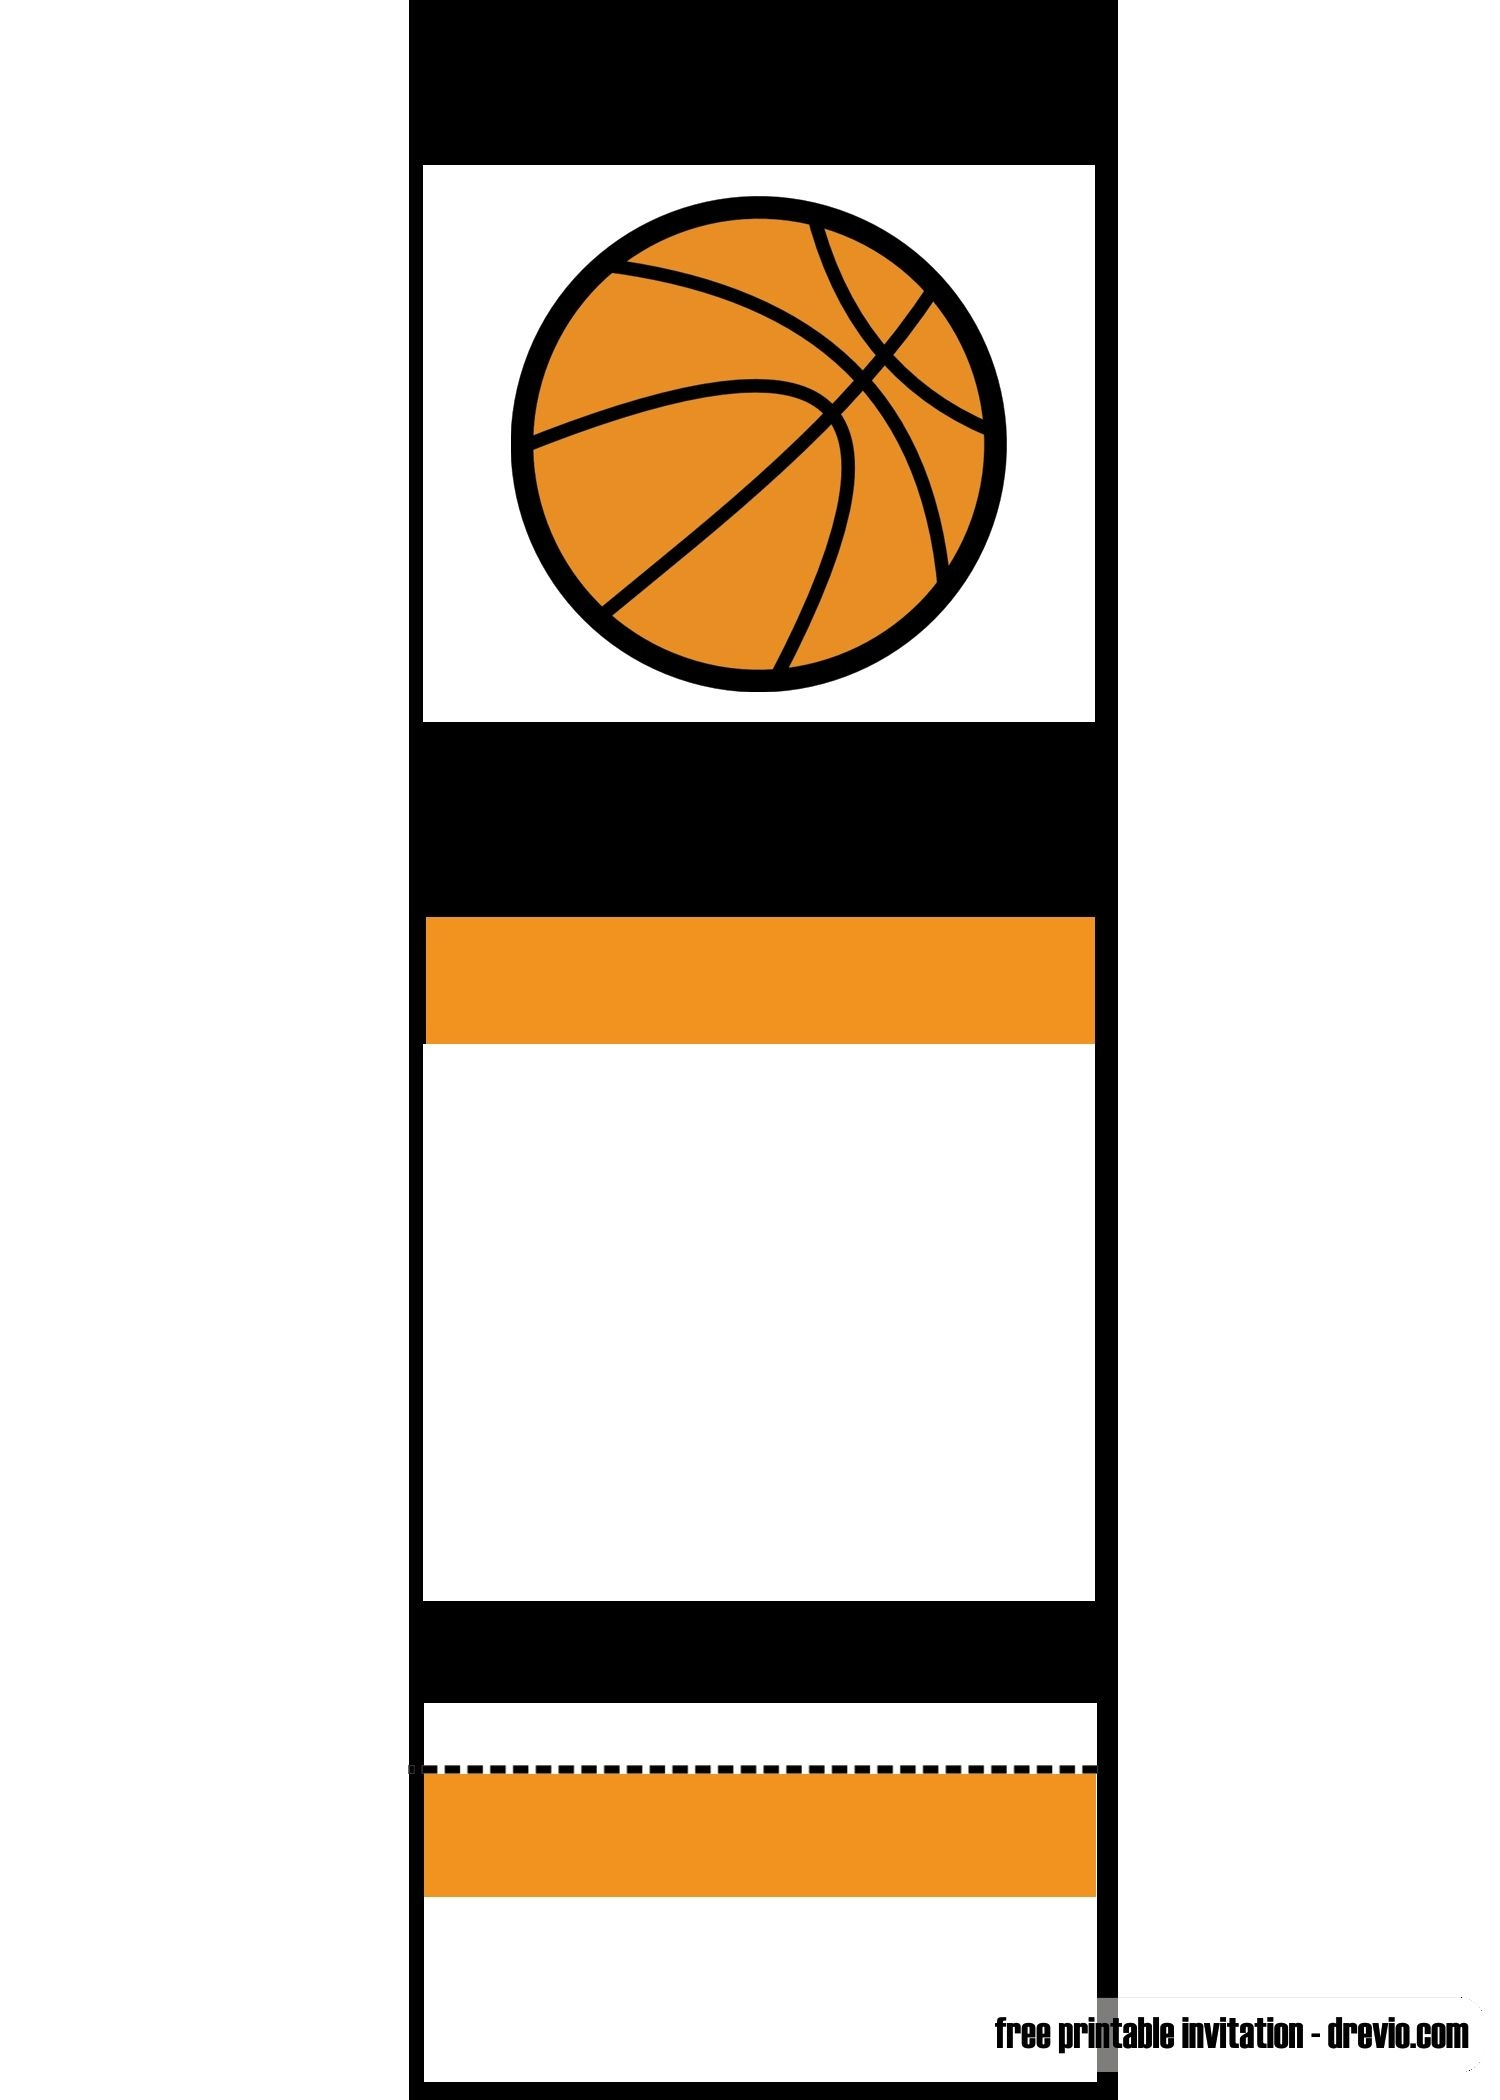 Free Printable Basketball Ticket Invitation | Unc Vs Gonzaga - Free Printable Ticket Invitation Templates